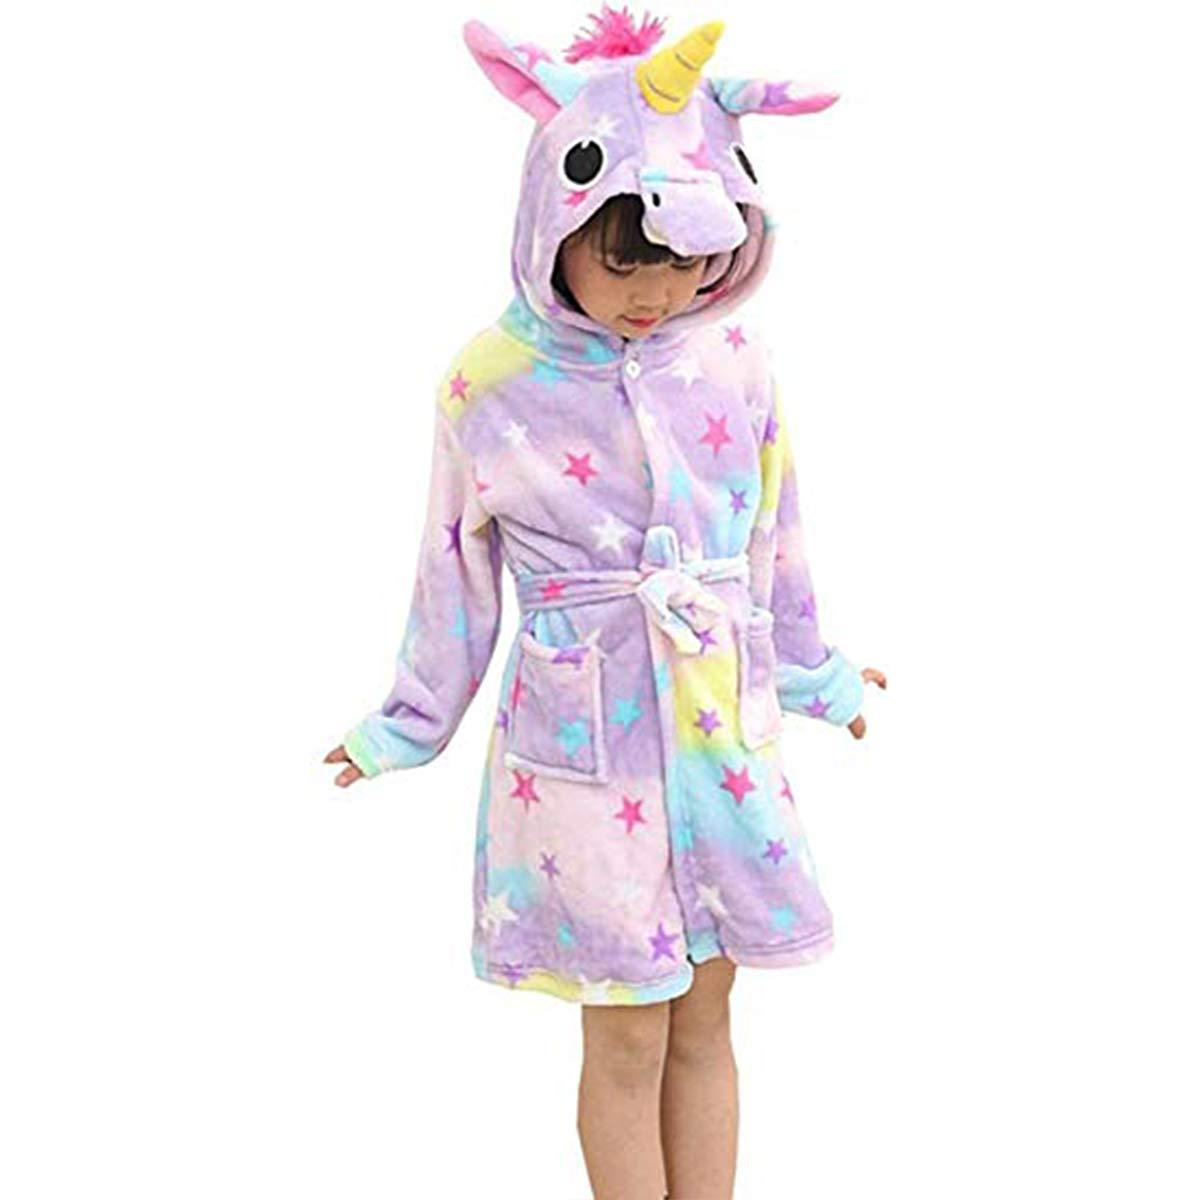 BovoYa Albornoz para ni/ños 110 Monedero 100 140 120 Albornoz de Pijama para ni/ños de Dibujos Animados Unicornio con Capucha Toalla de ba/ño de Franela Animal para ni/ños 130